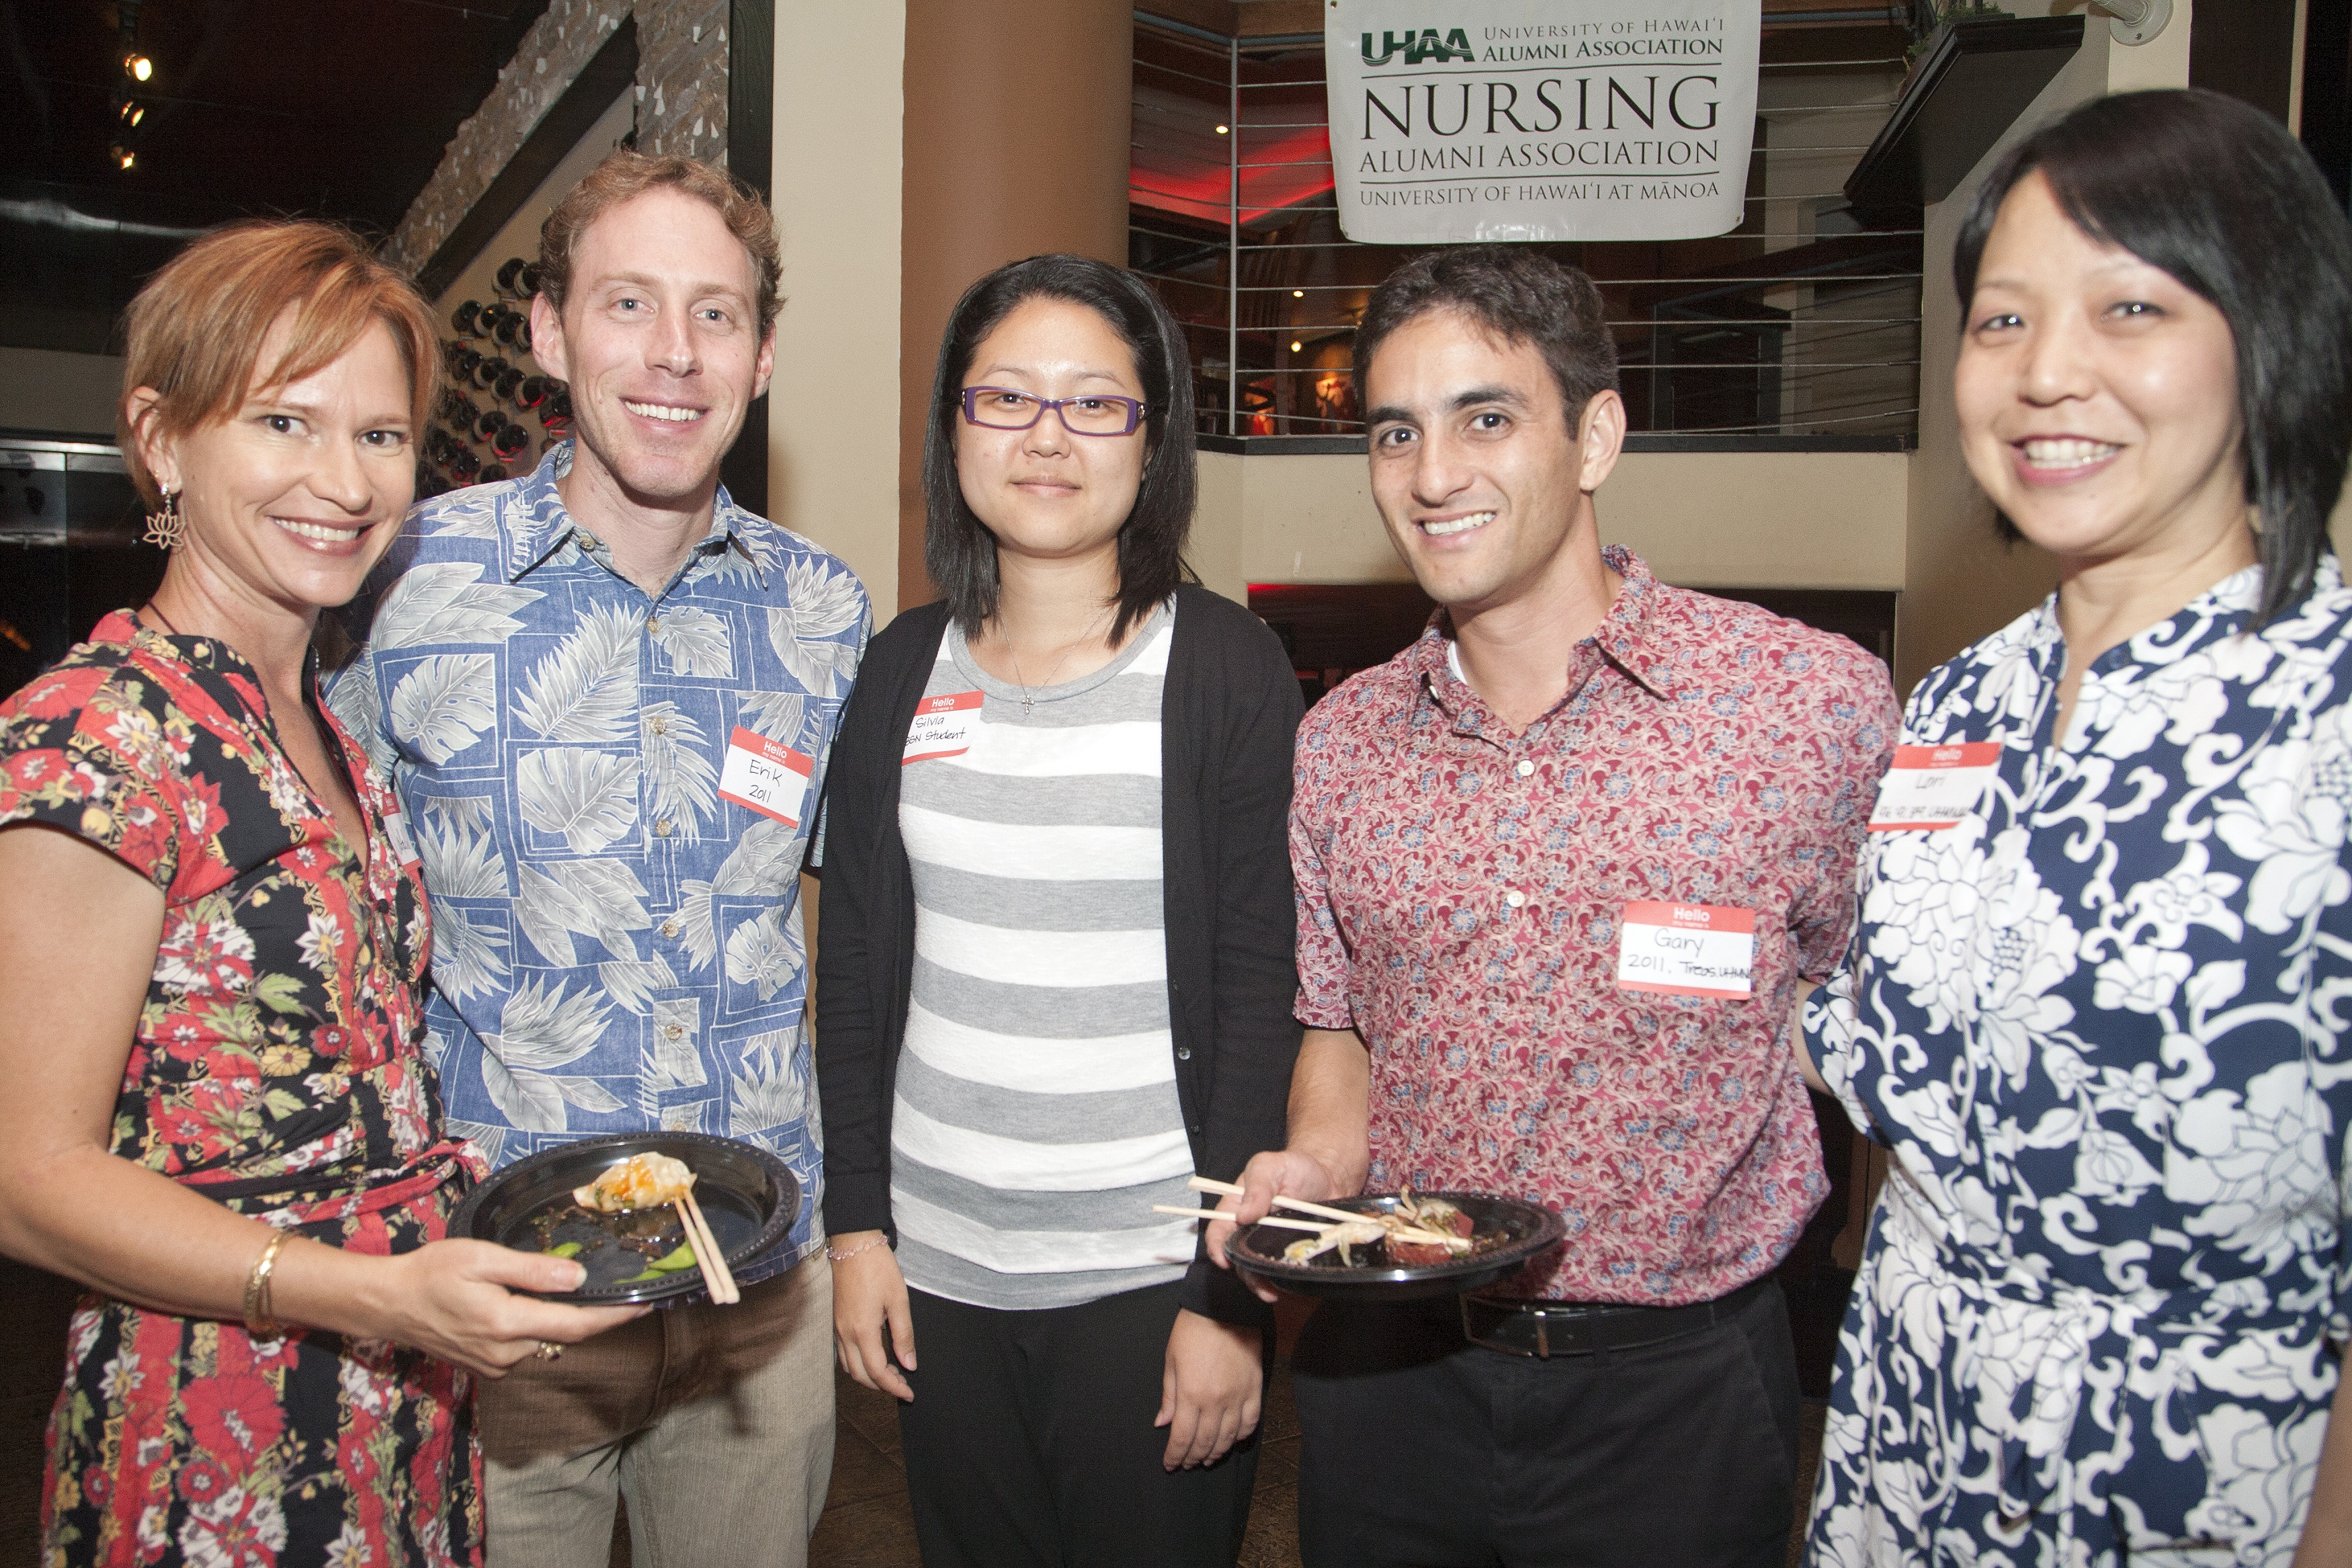 2nd Annual Alumni Homecoming Pau Hana group photo